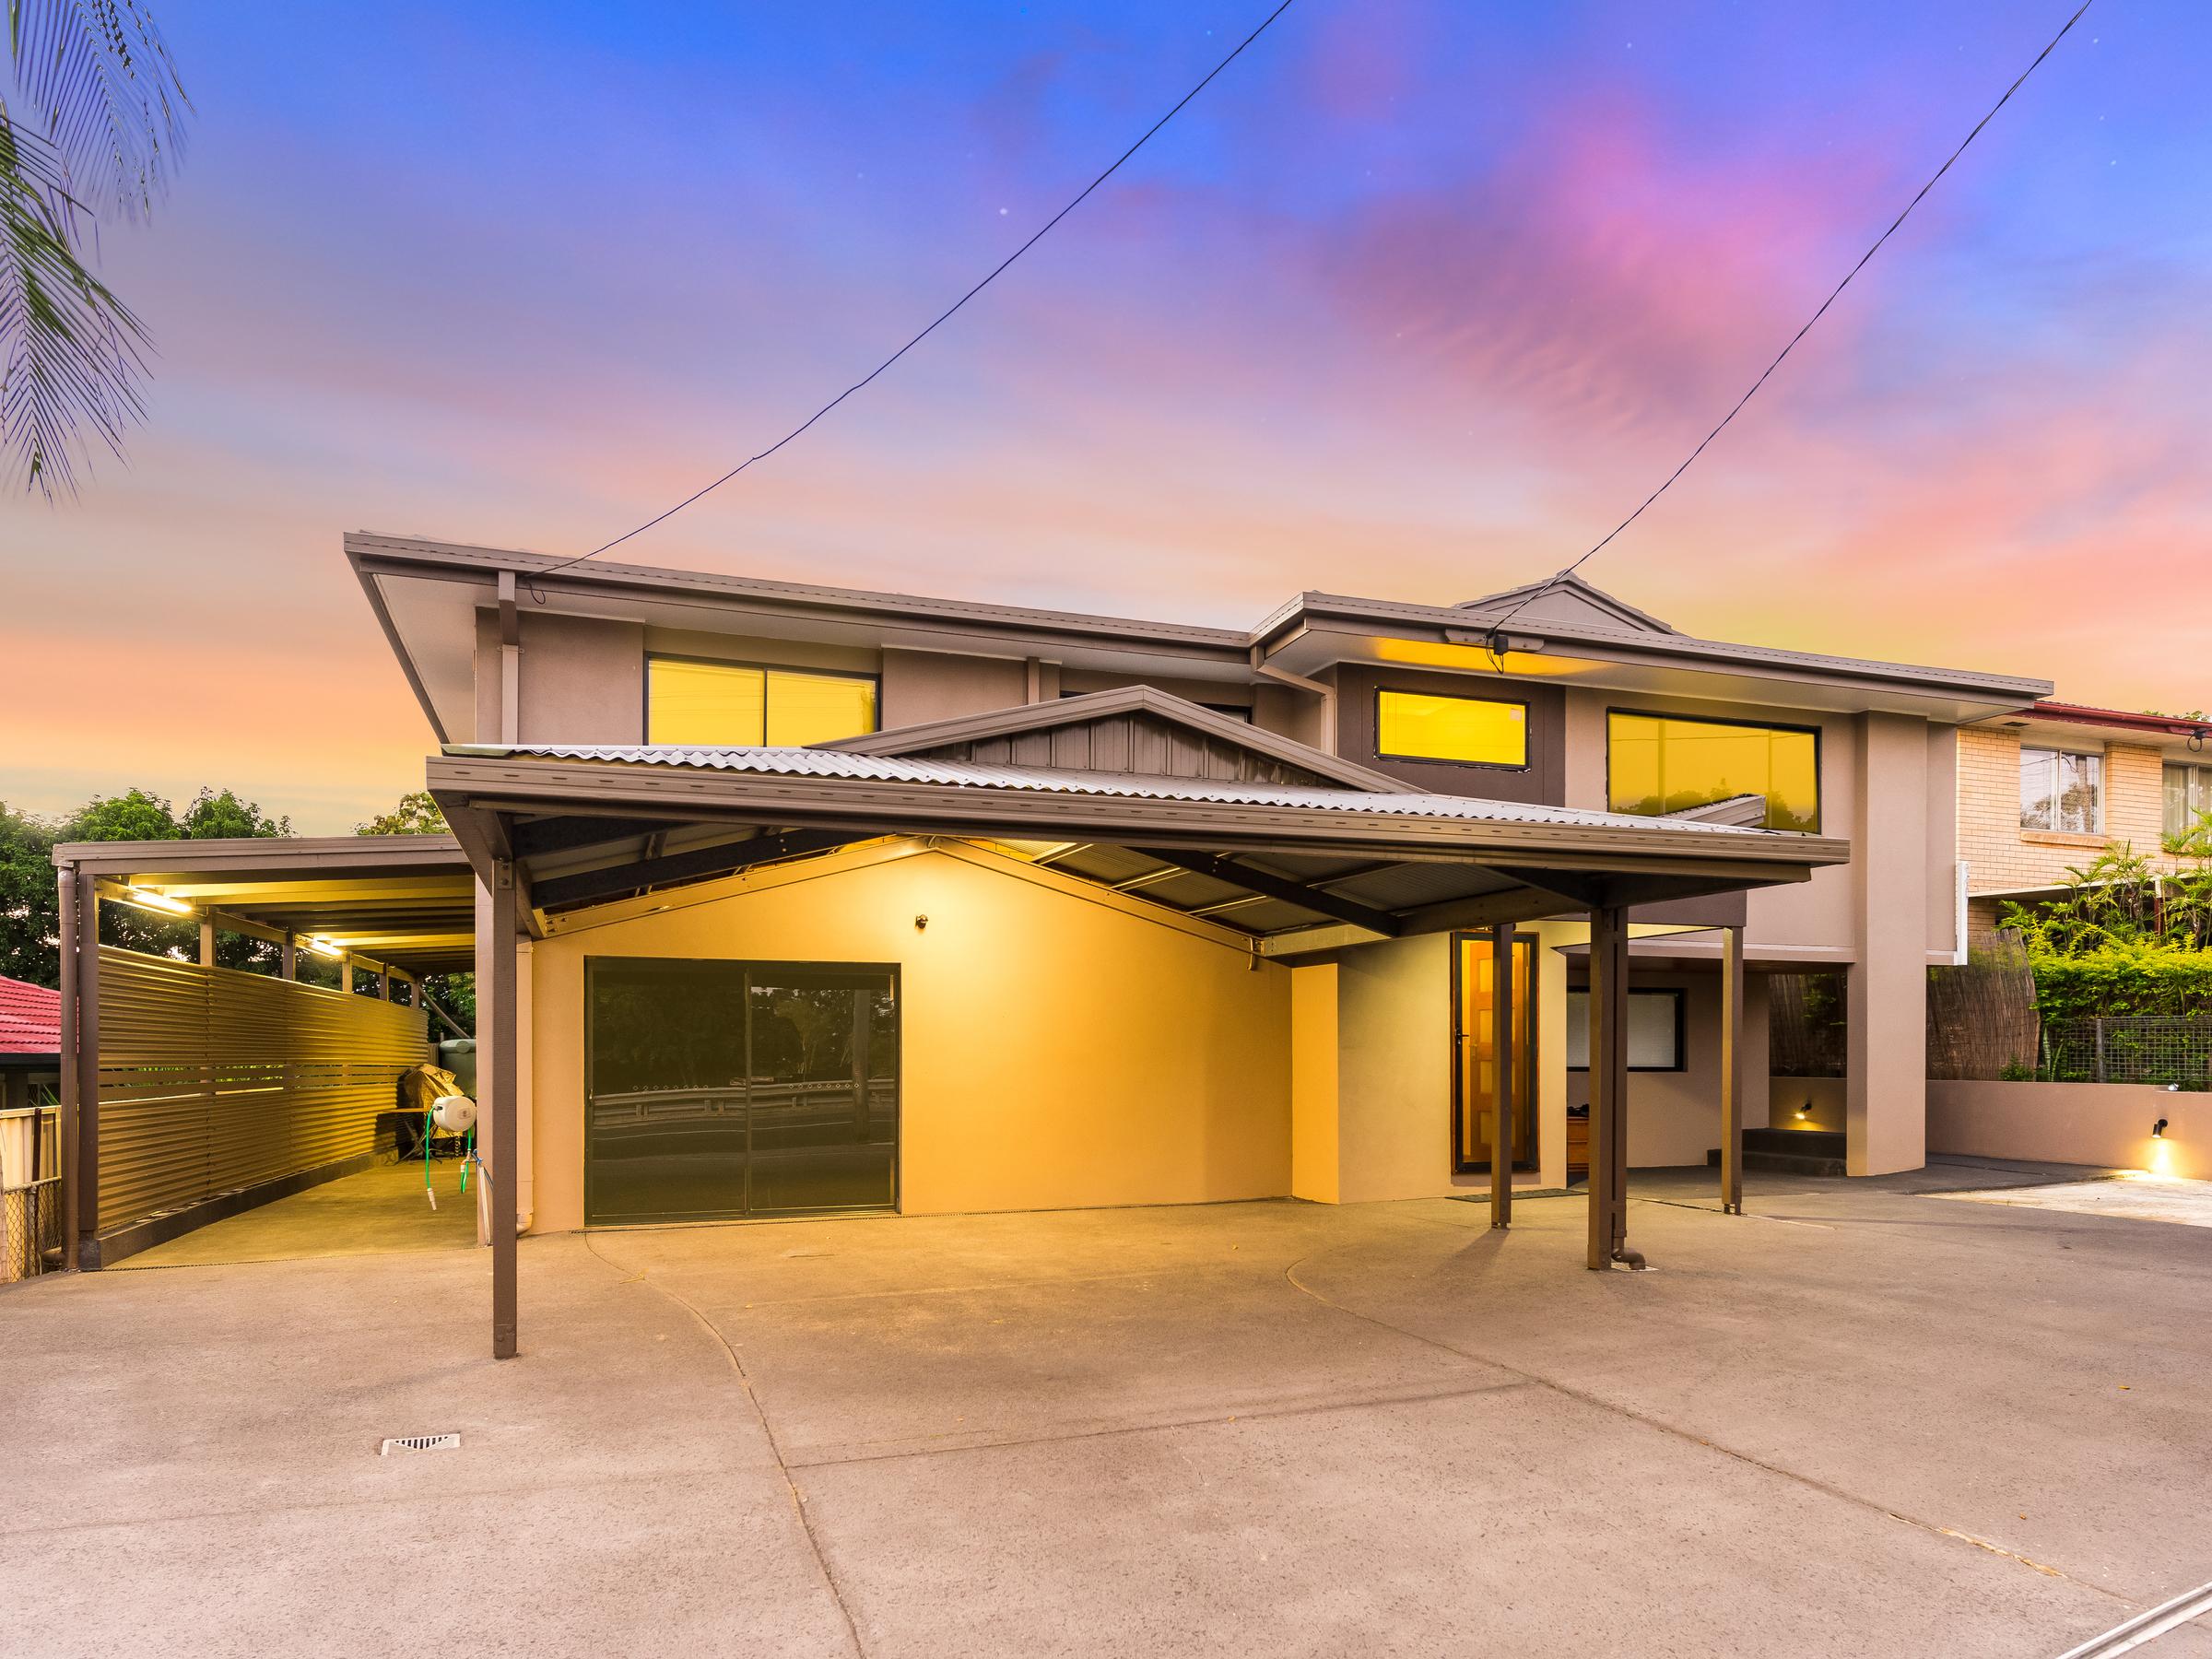 Commercial real estate for sale in mount gravatt east qld 4122 pg 3 - 338 Mount Gravatt Capalaba Road Wishart Qld 4122 3 2 6